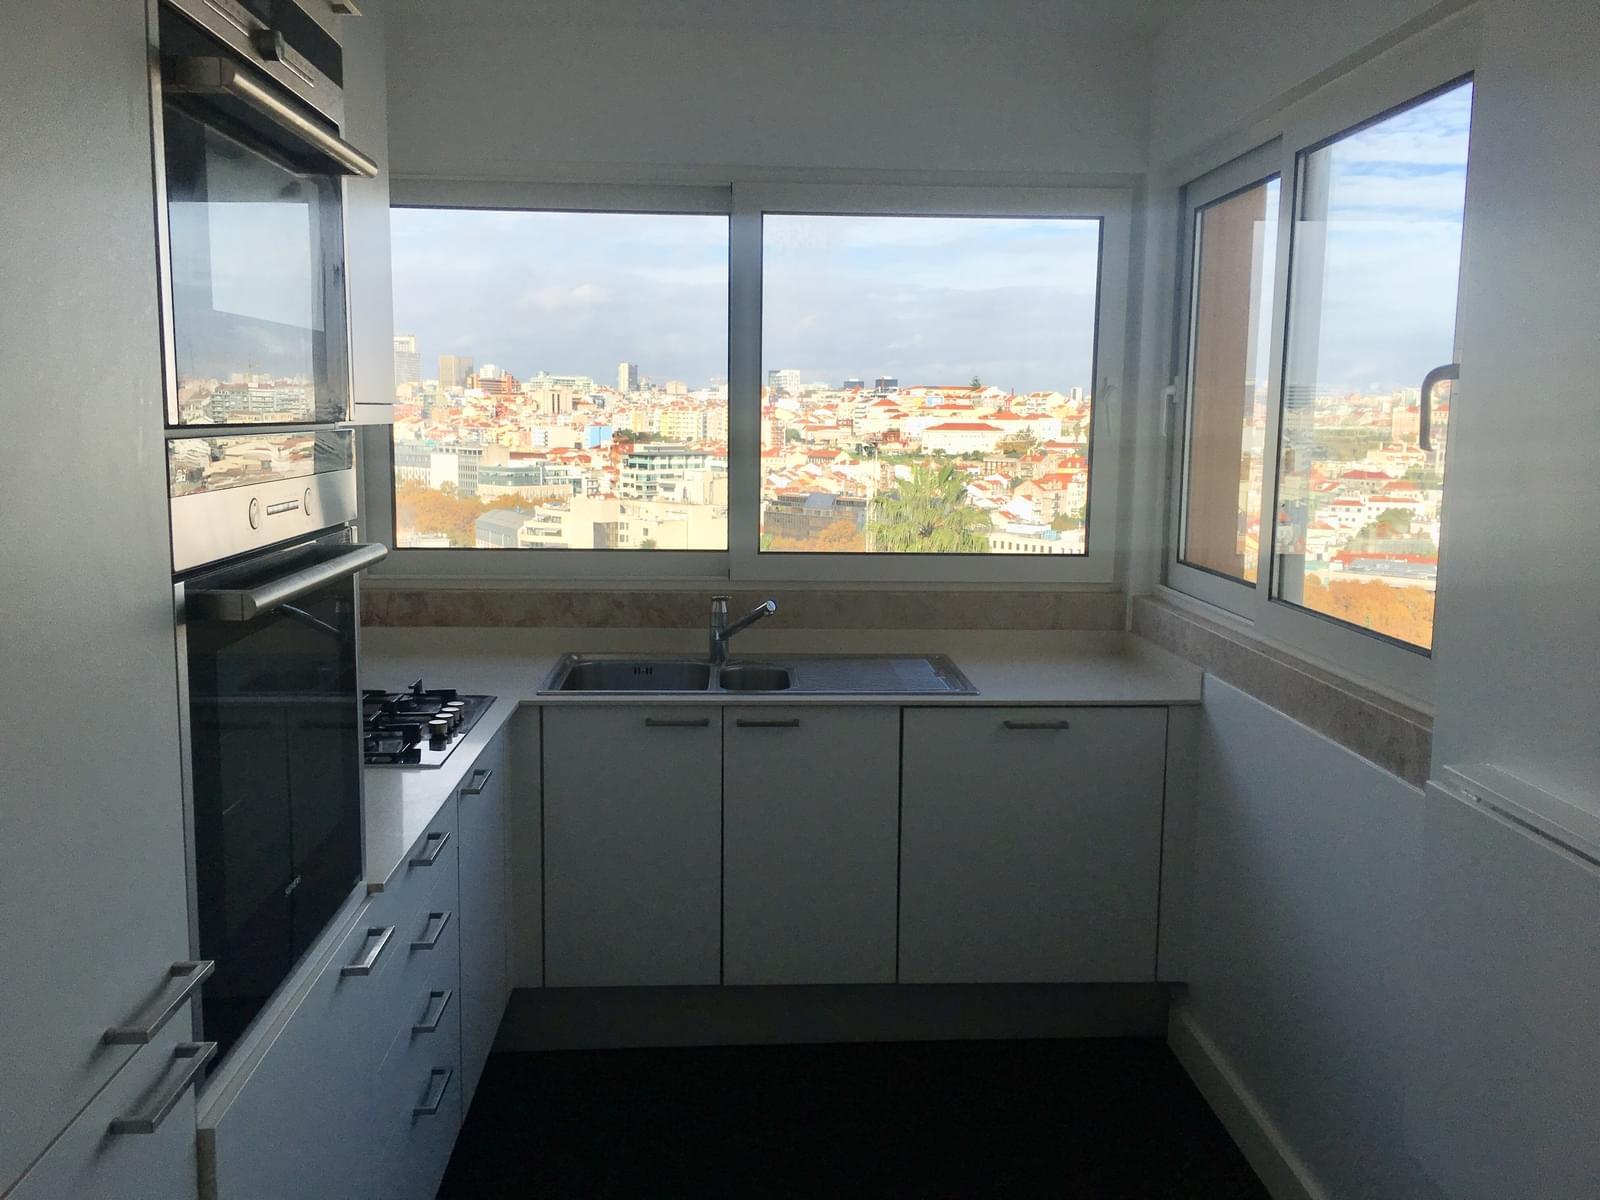 pf18822-apartamento-t1-lisboa-f69e2a16-4a85-4a2f-8b6f-26c021b7572d